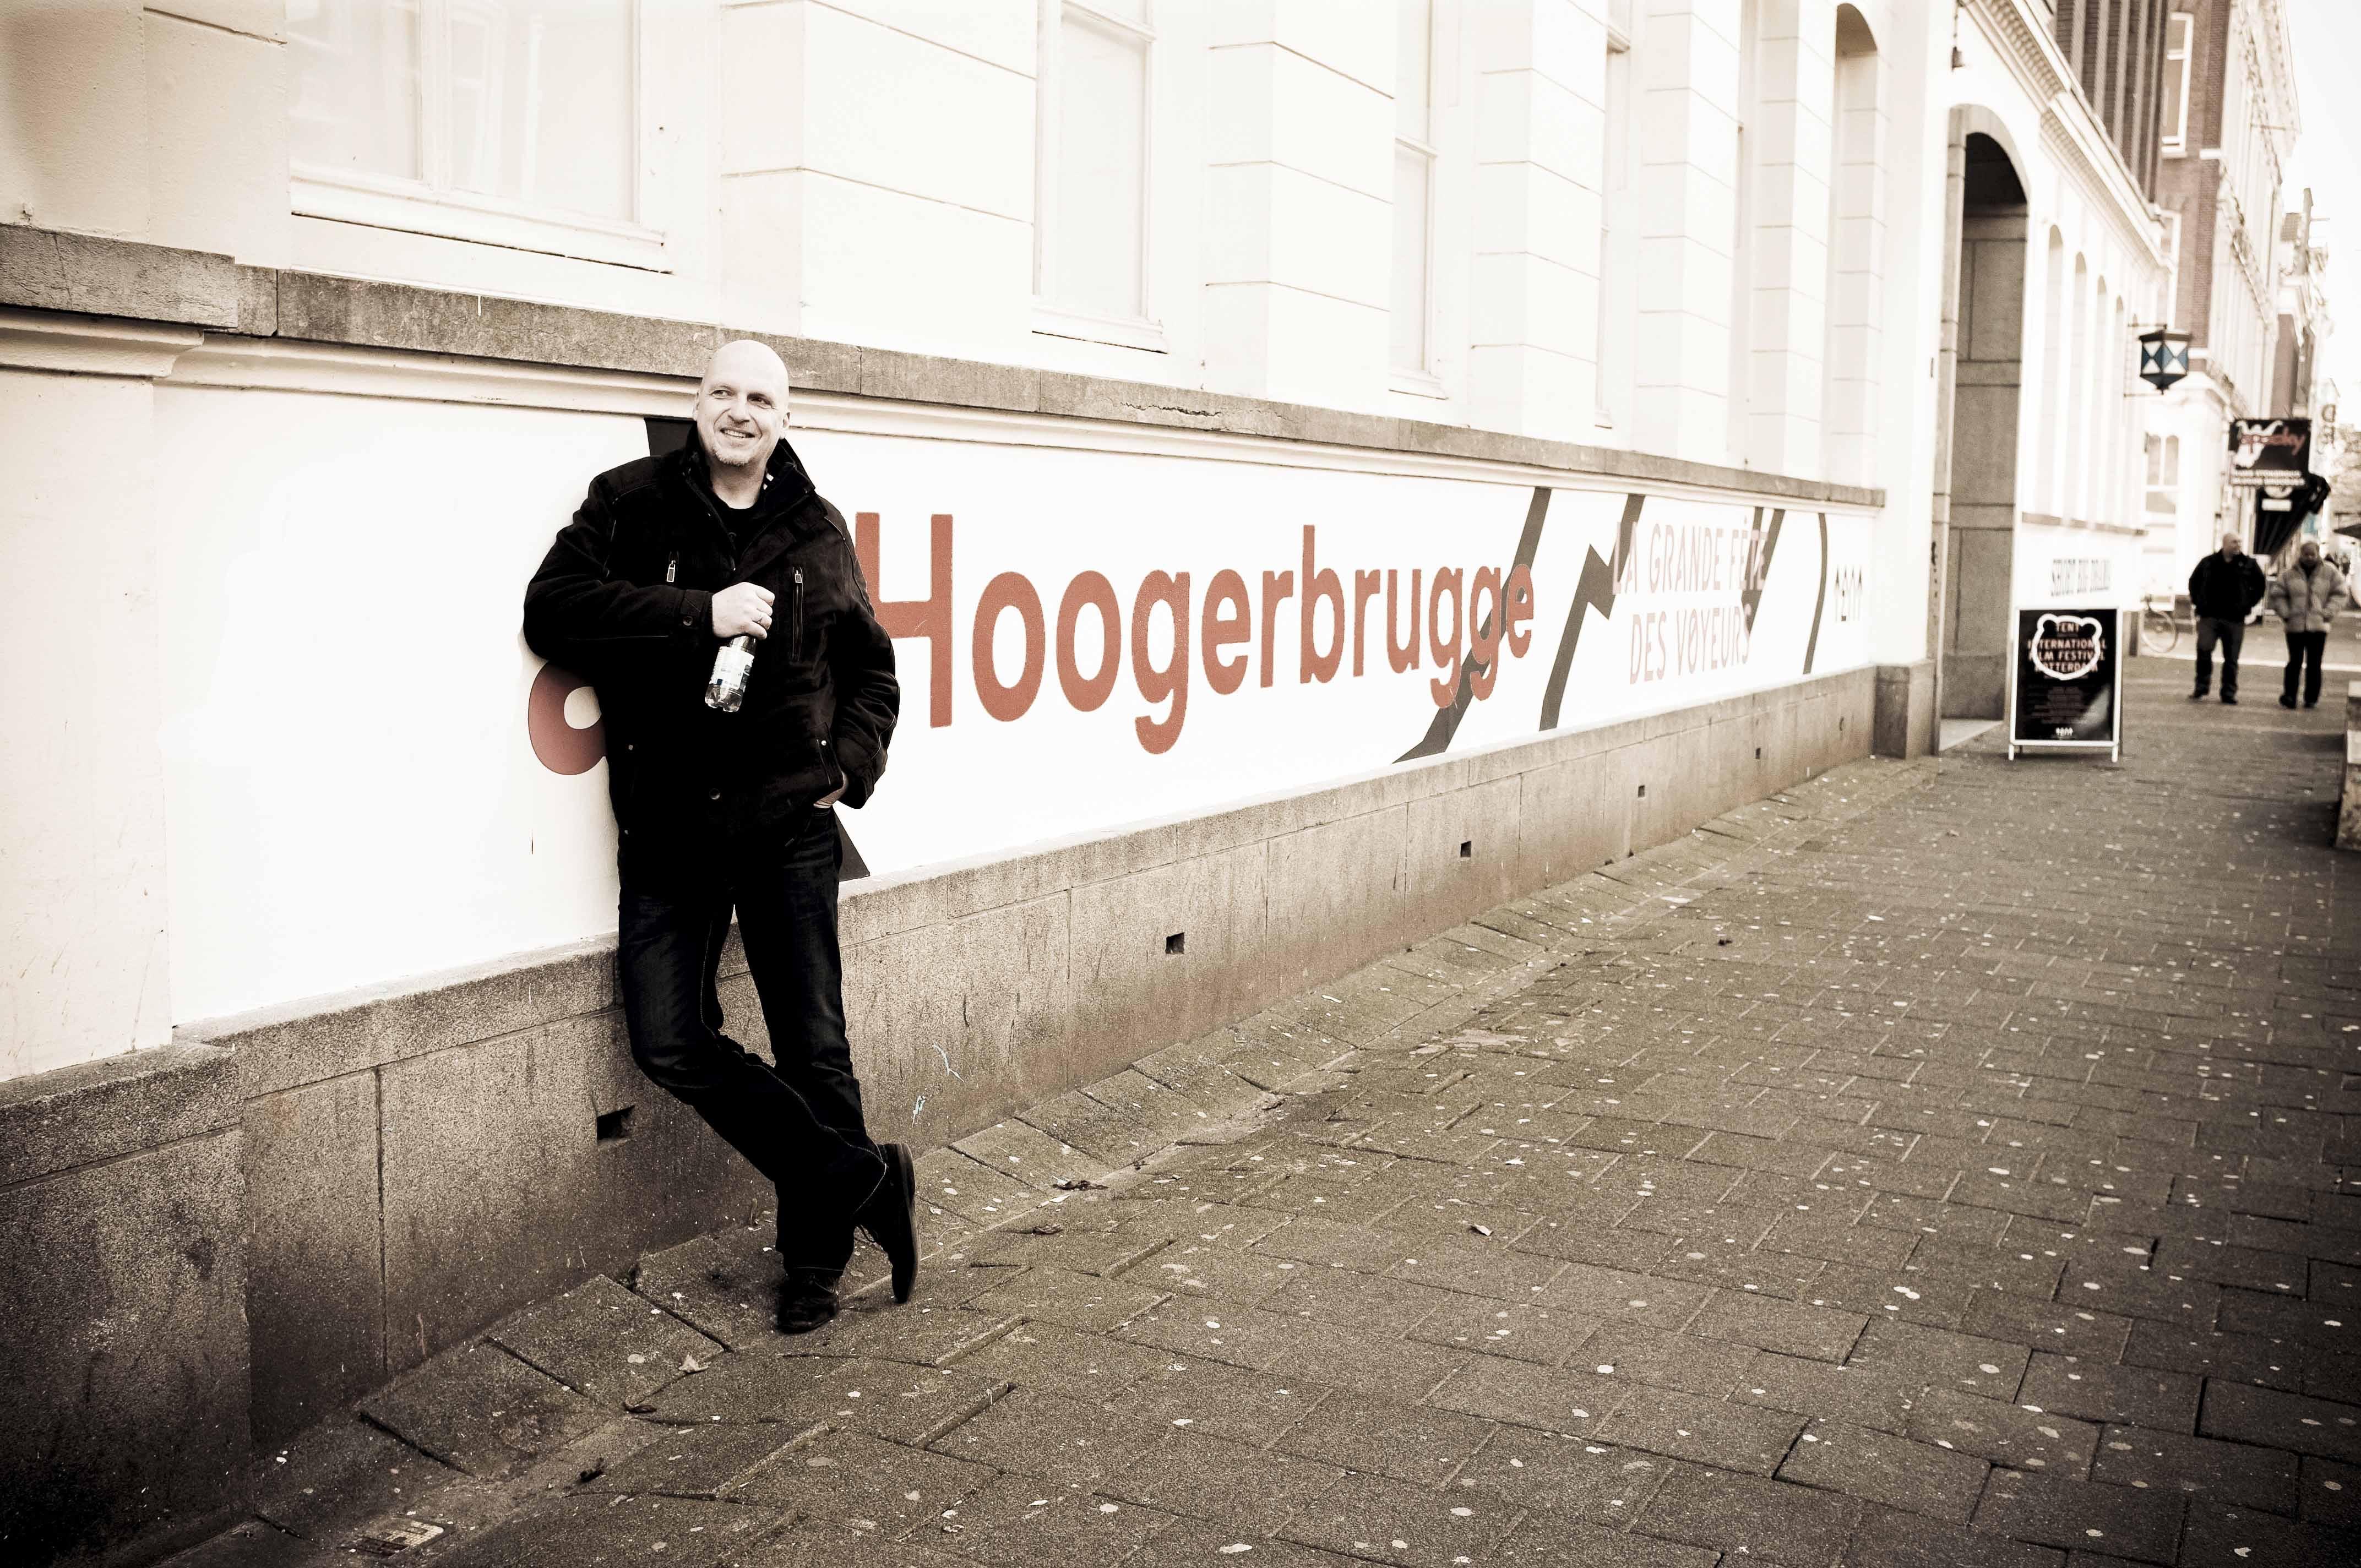 Go to Philip Hoogerbrugge's profile